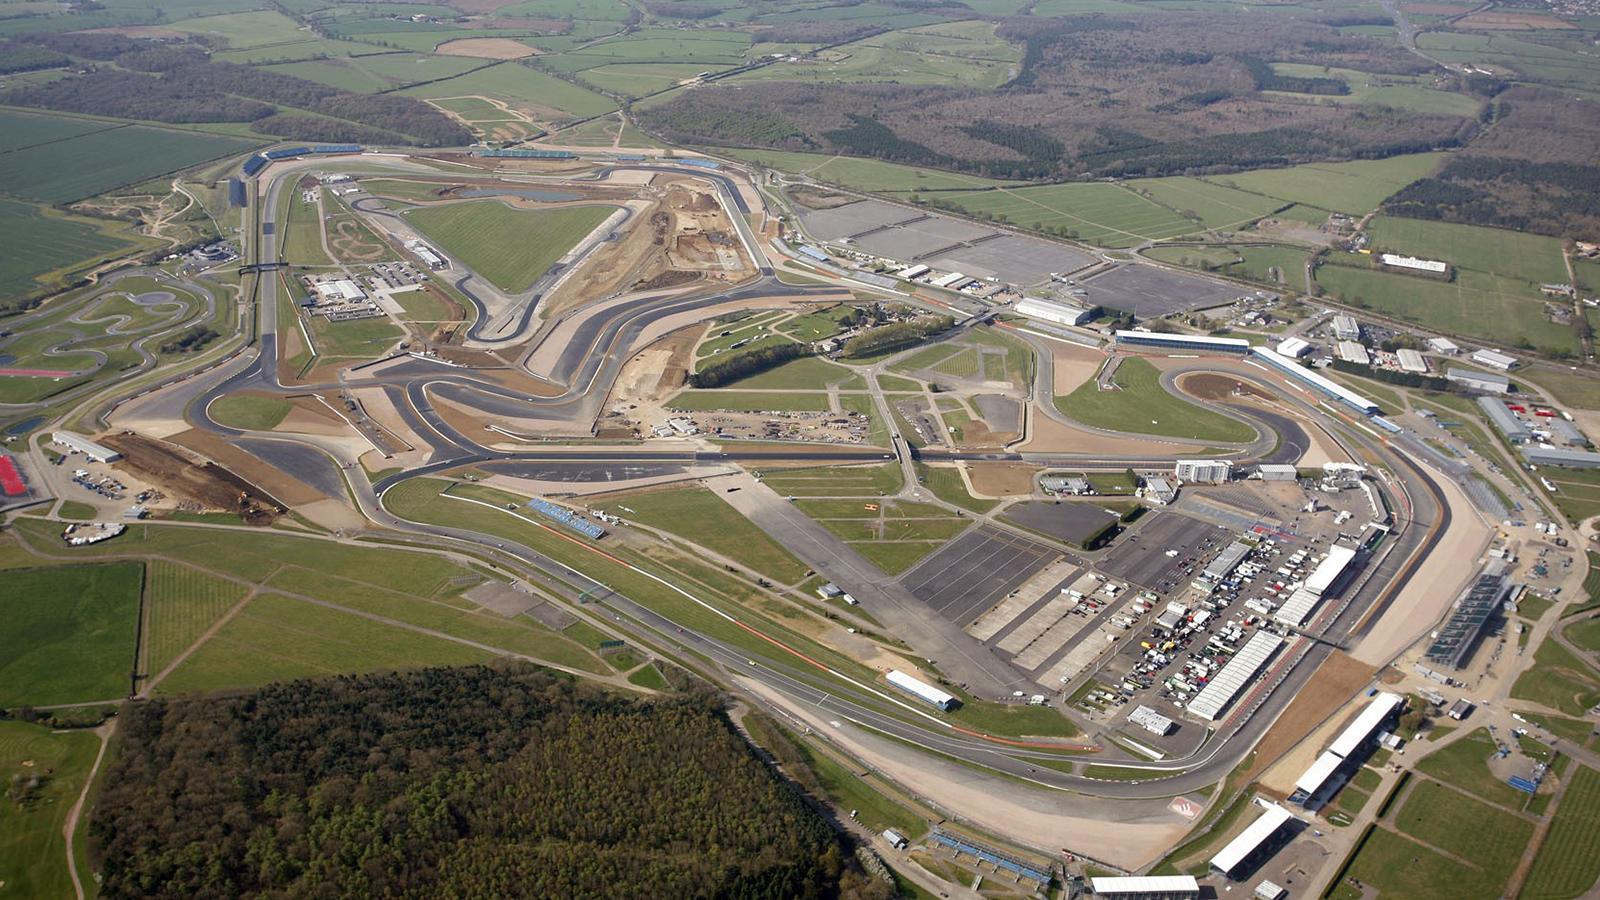 Silverstone, England - Round Four, 11 - 13 October 2019, Silverstone, England.Pure McLaren GT Series> Watch live on TSL